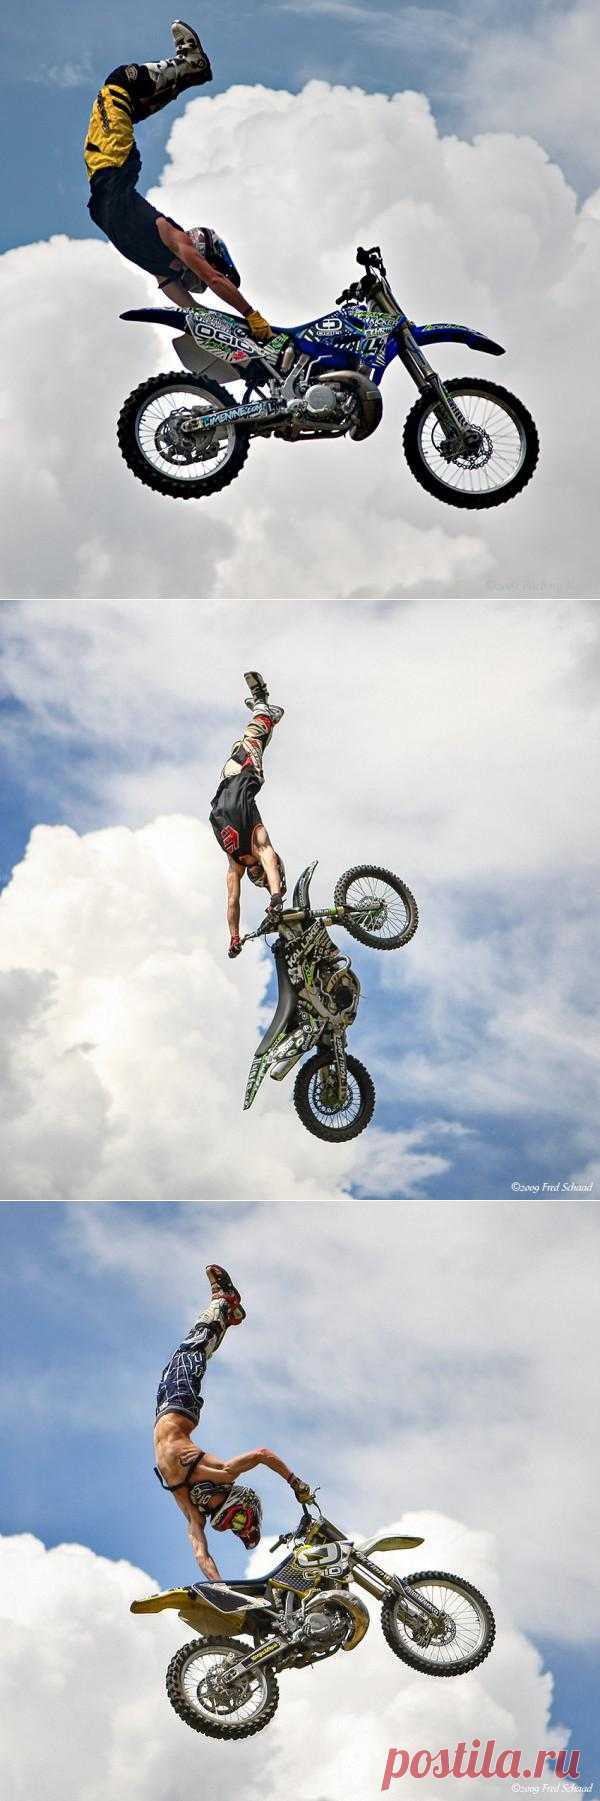 Полеты на мотоциклах не во сне, а наяву